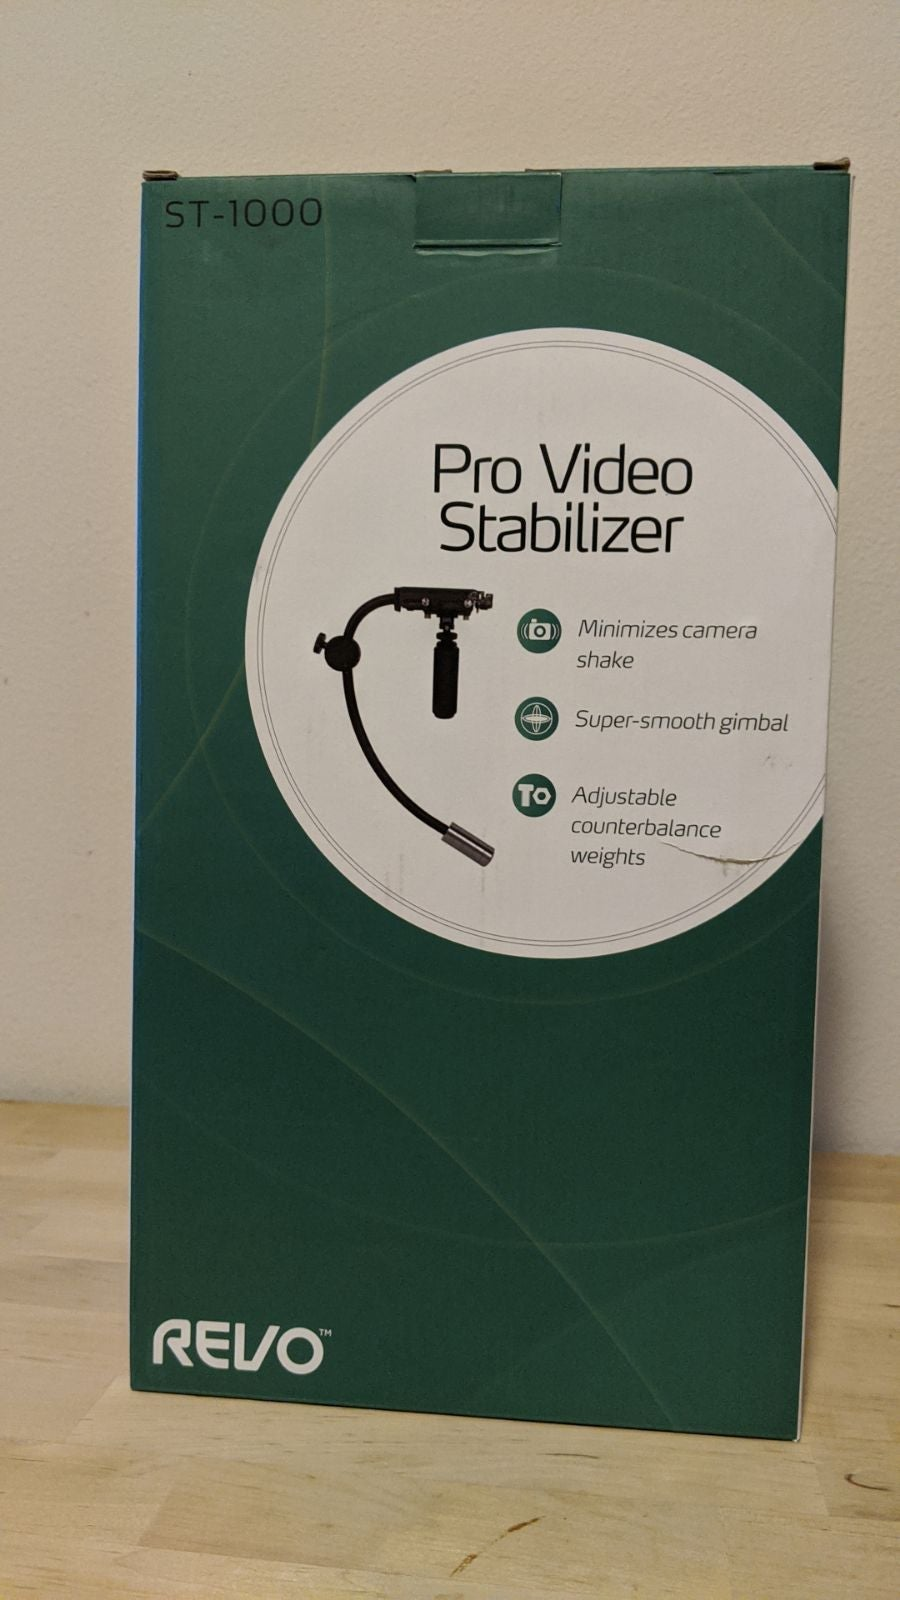 Revo Video Stabilizer ST-1000